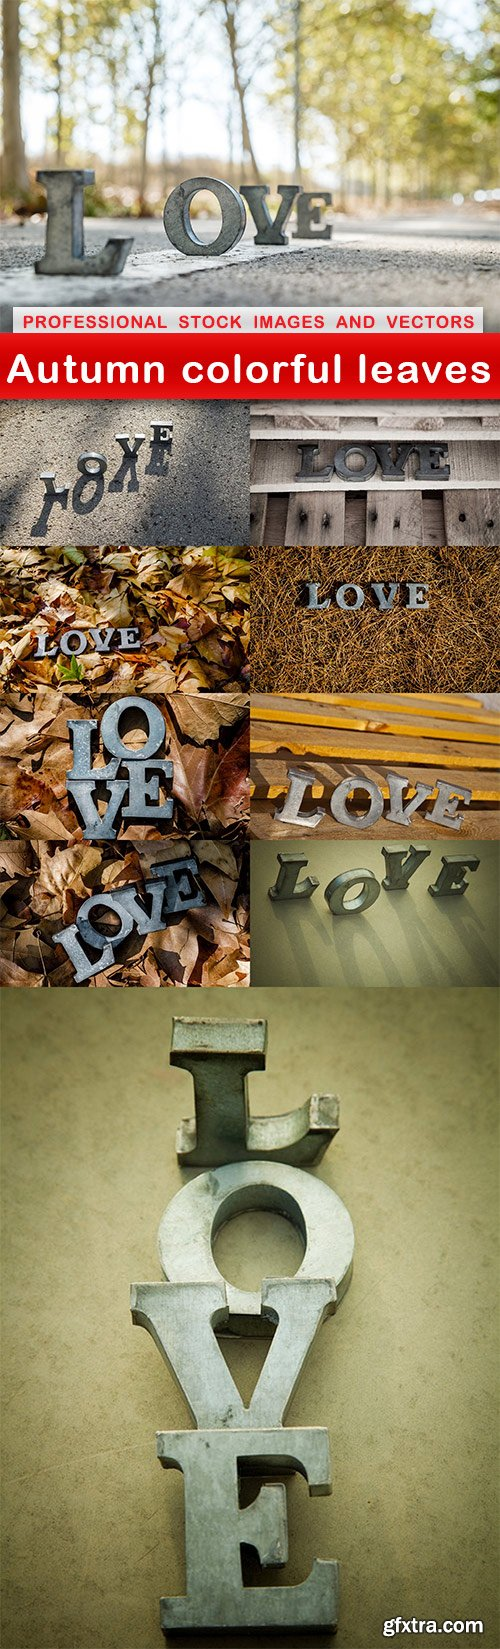 Autumn colorful leaves - 10 UHQ JPEG